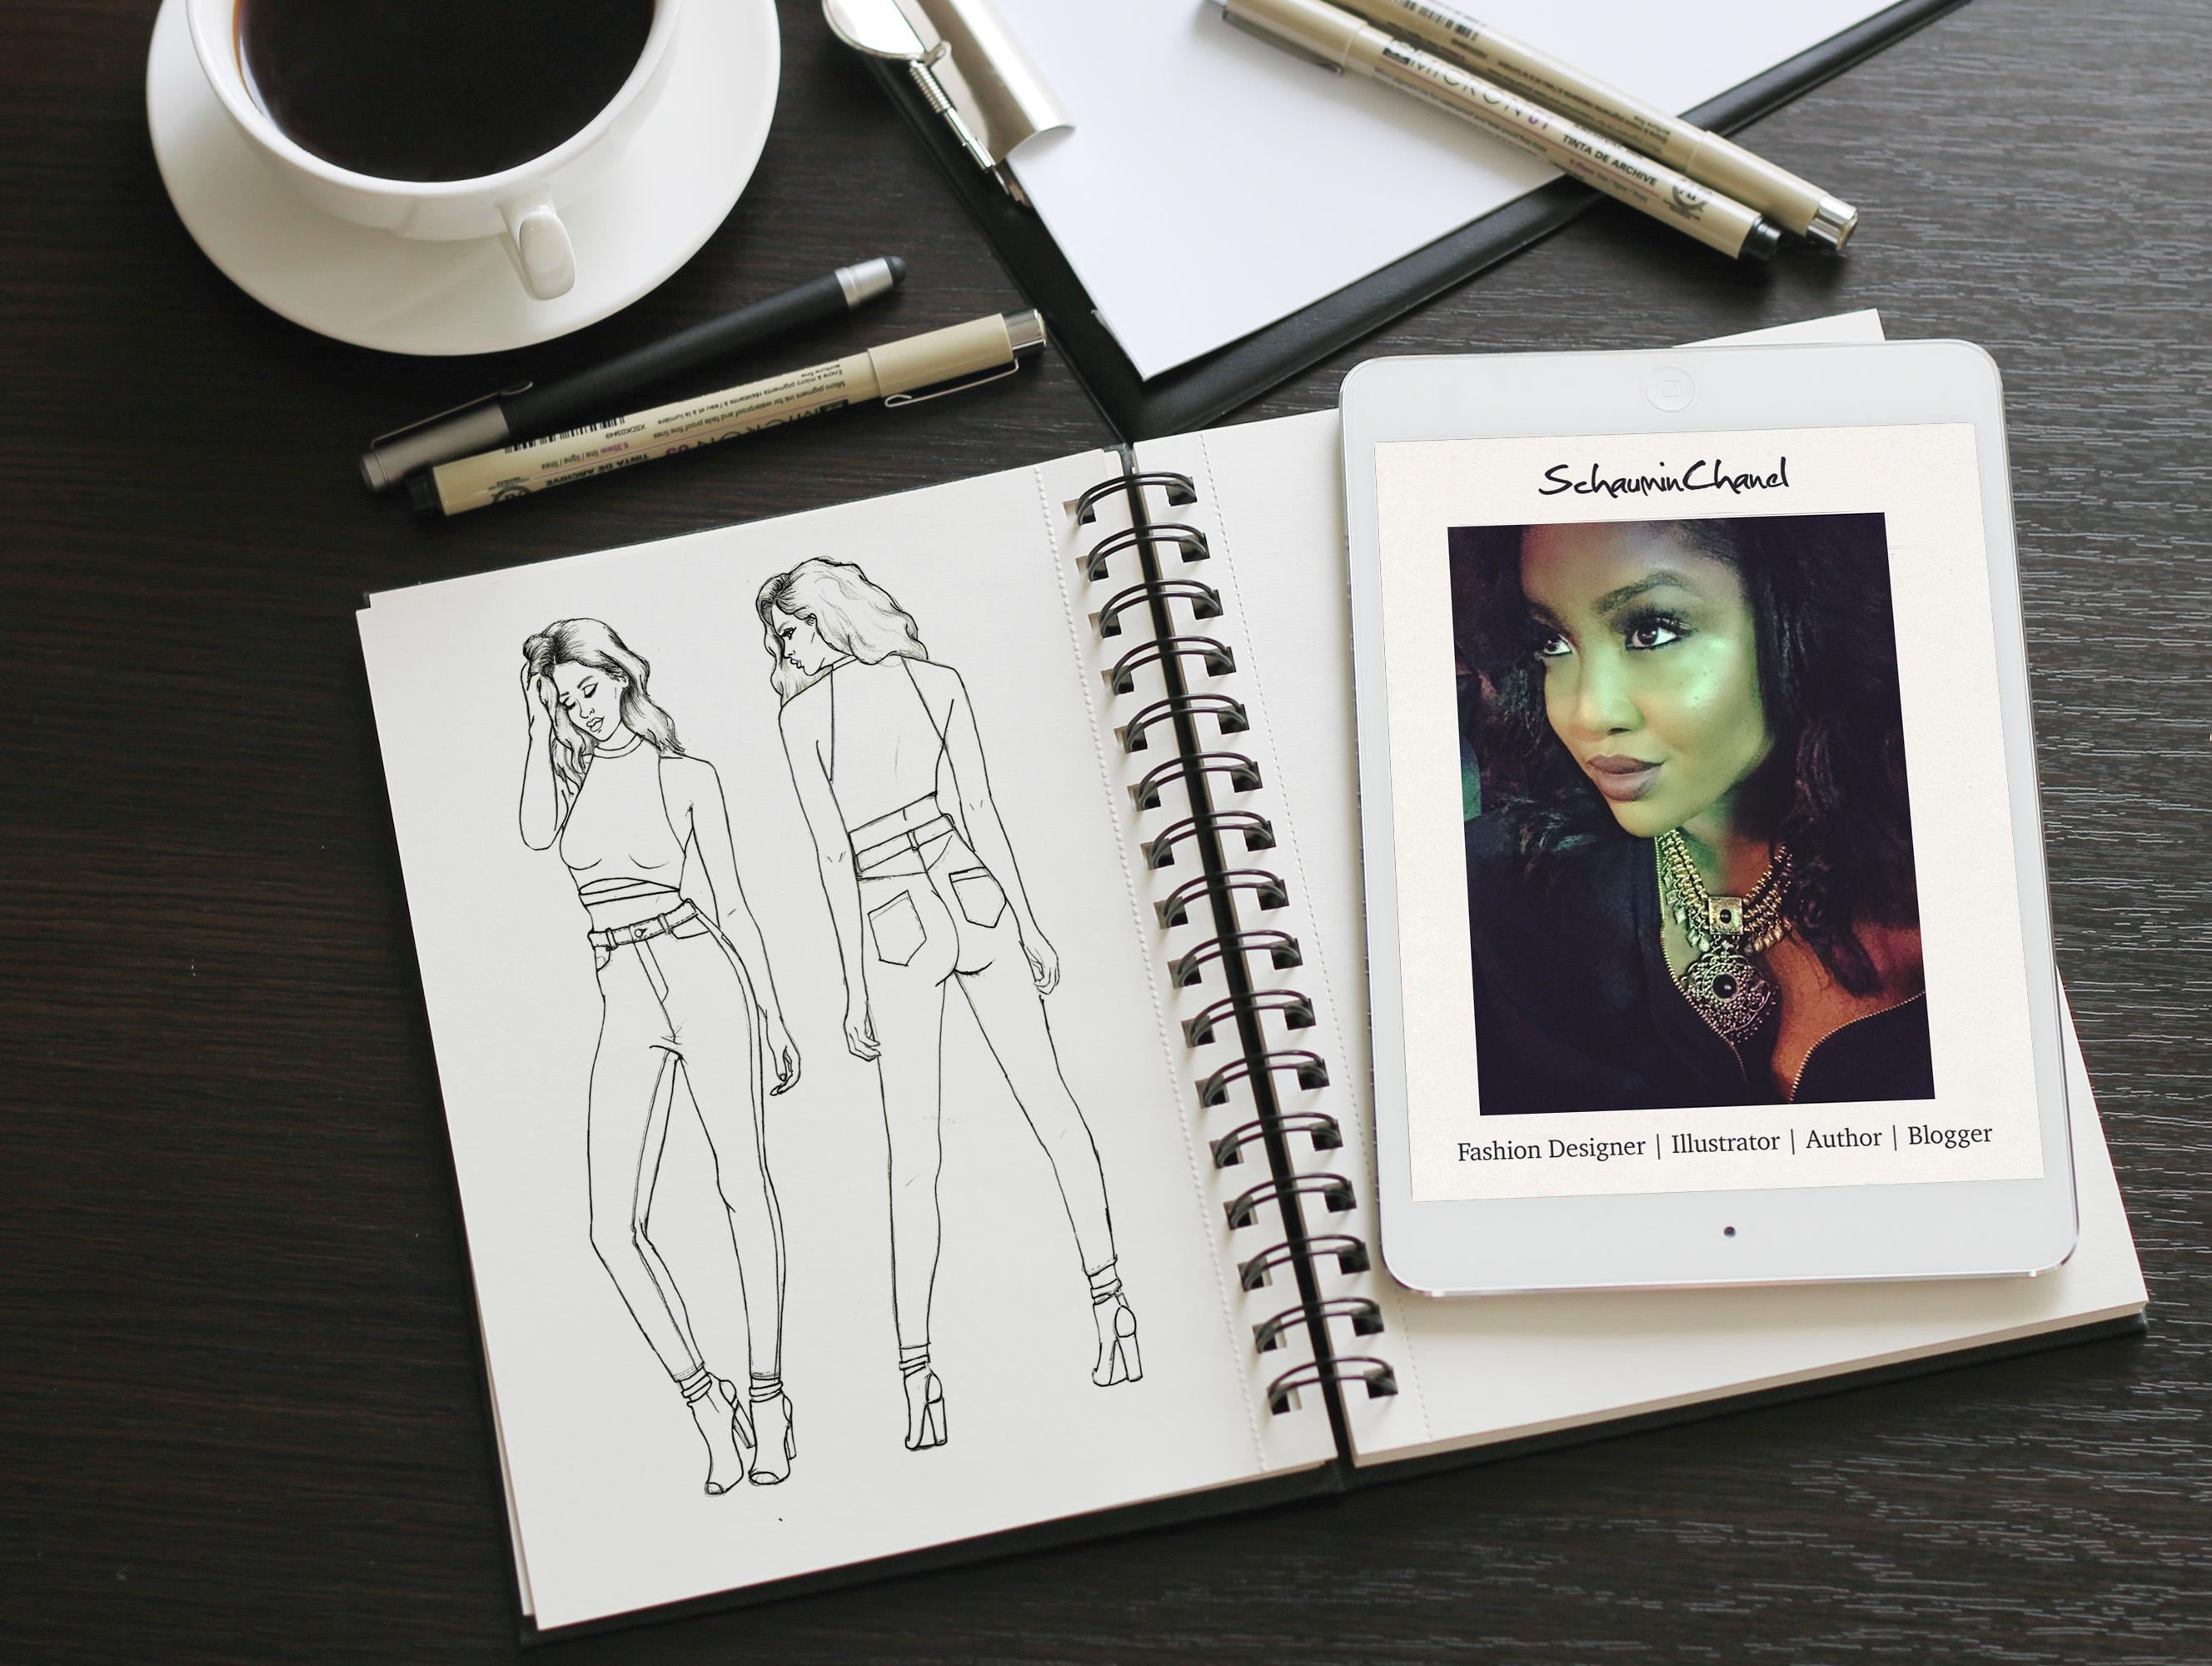 Photoshop For Fashion Transform Your Hand Drawn Fashion Sketch In Minutes Schauminchanel Alexander Skillshare